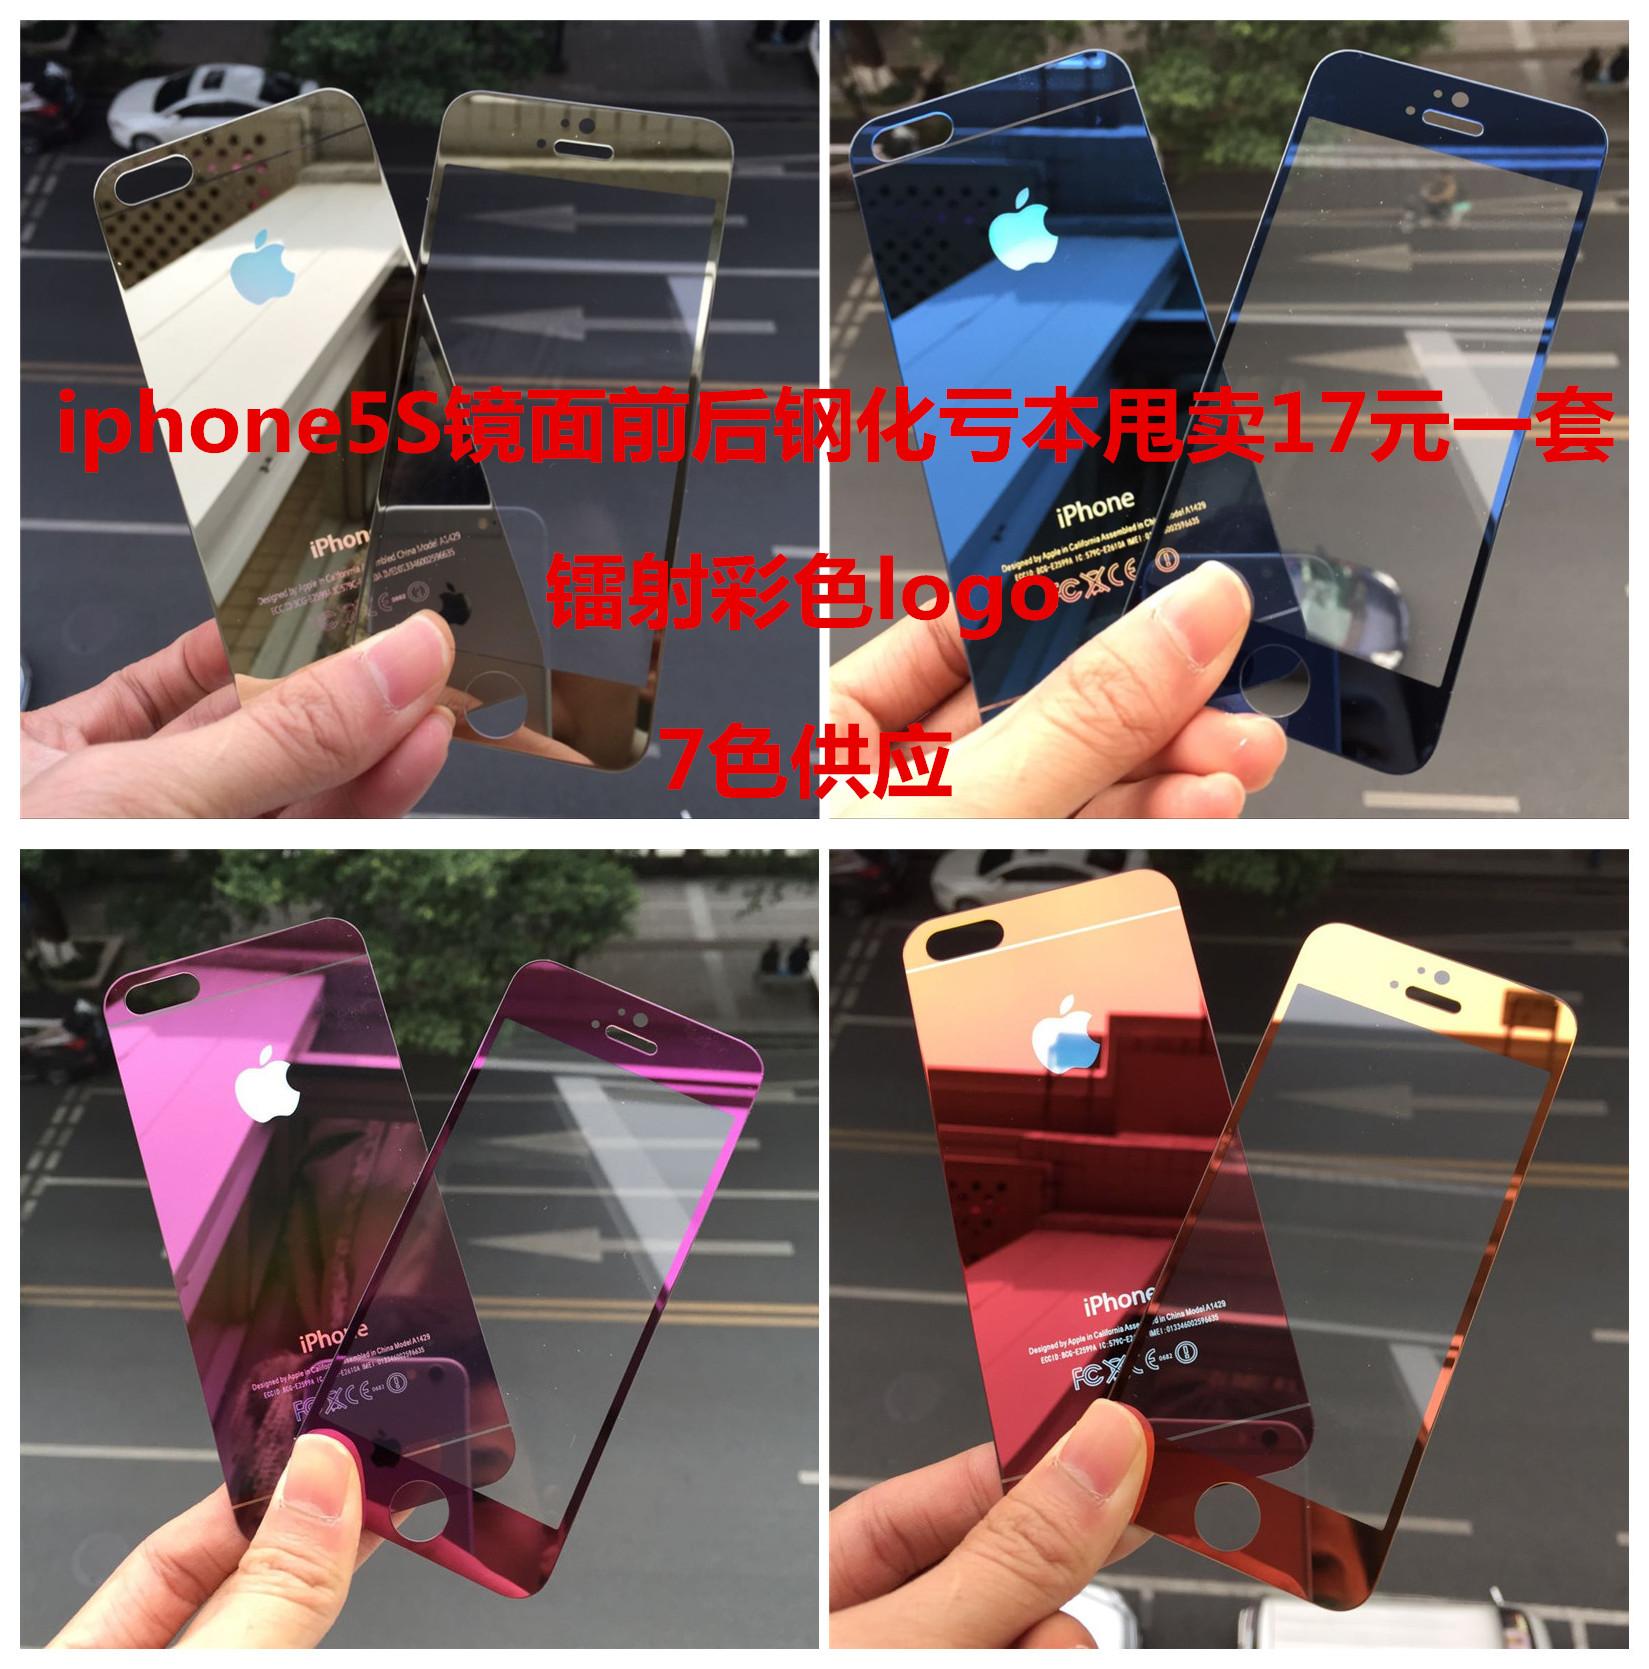 Apple защитная плёнка для iPad Apple Iphone5s 5S Iphone5 apple чехол iphone5 iphone5s 5s